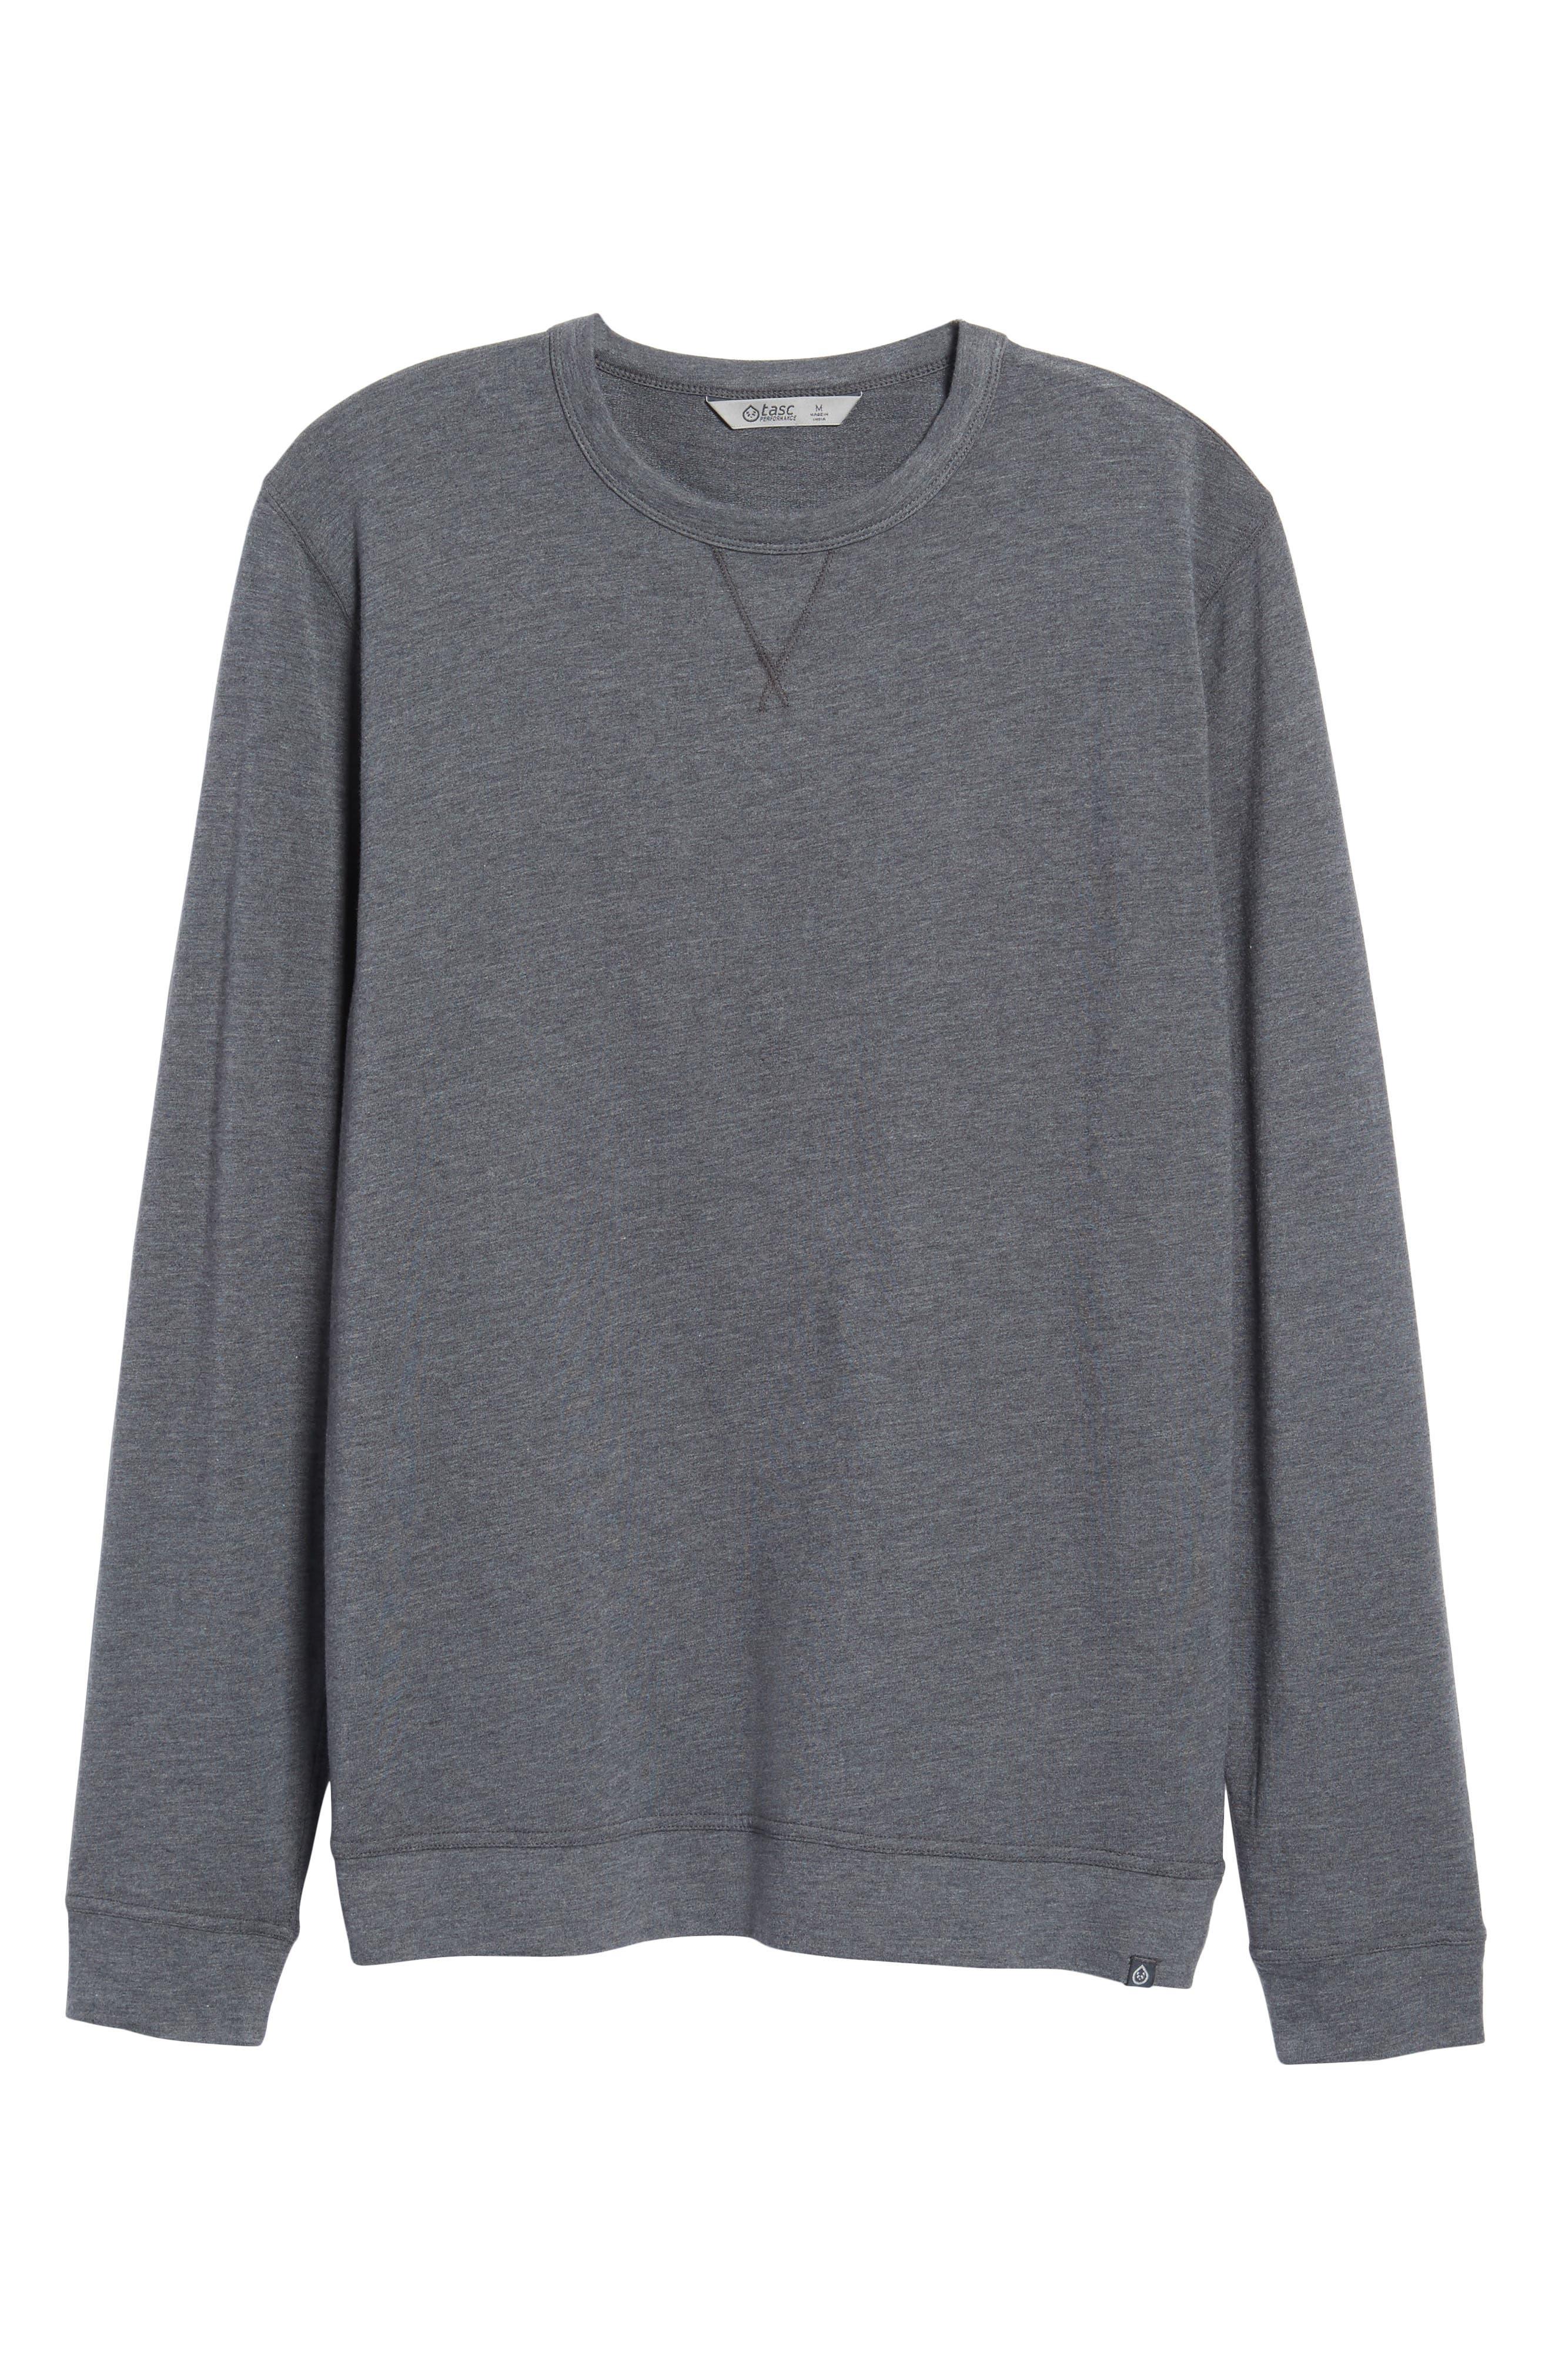 TASC PERFORMANCE, Legacy Crewneck Sweatshirt, Alternate thumbnail 6, color, BLACK HEATHER